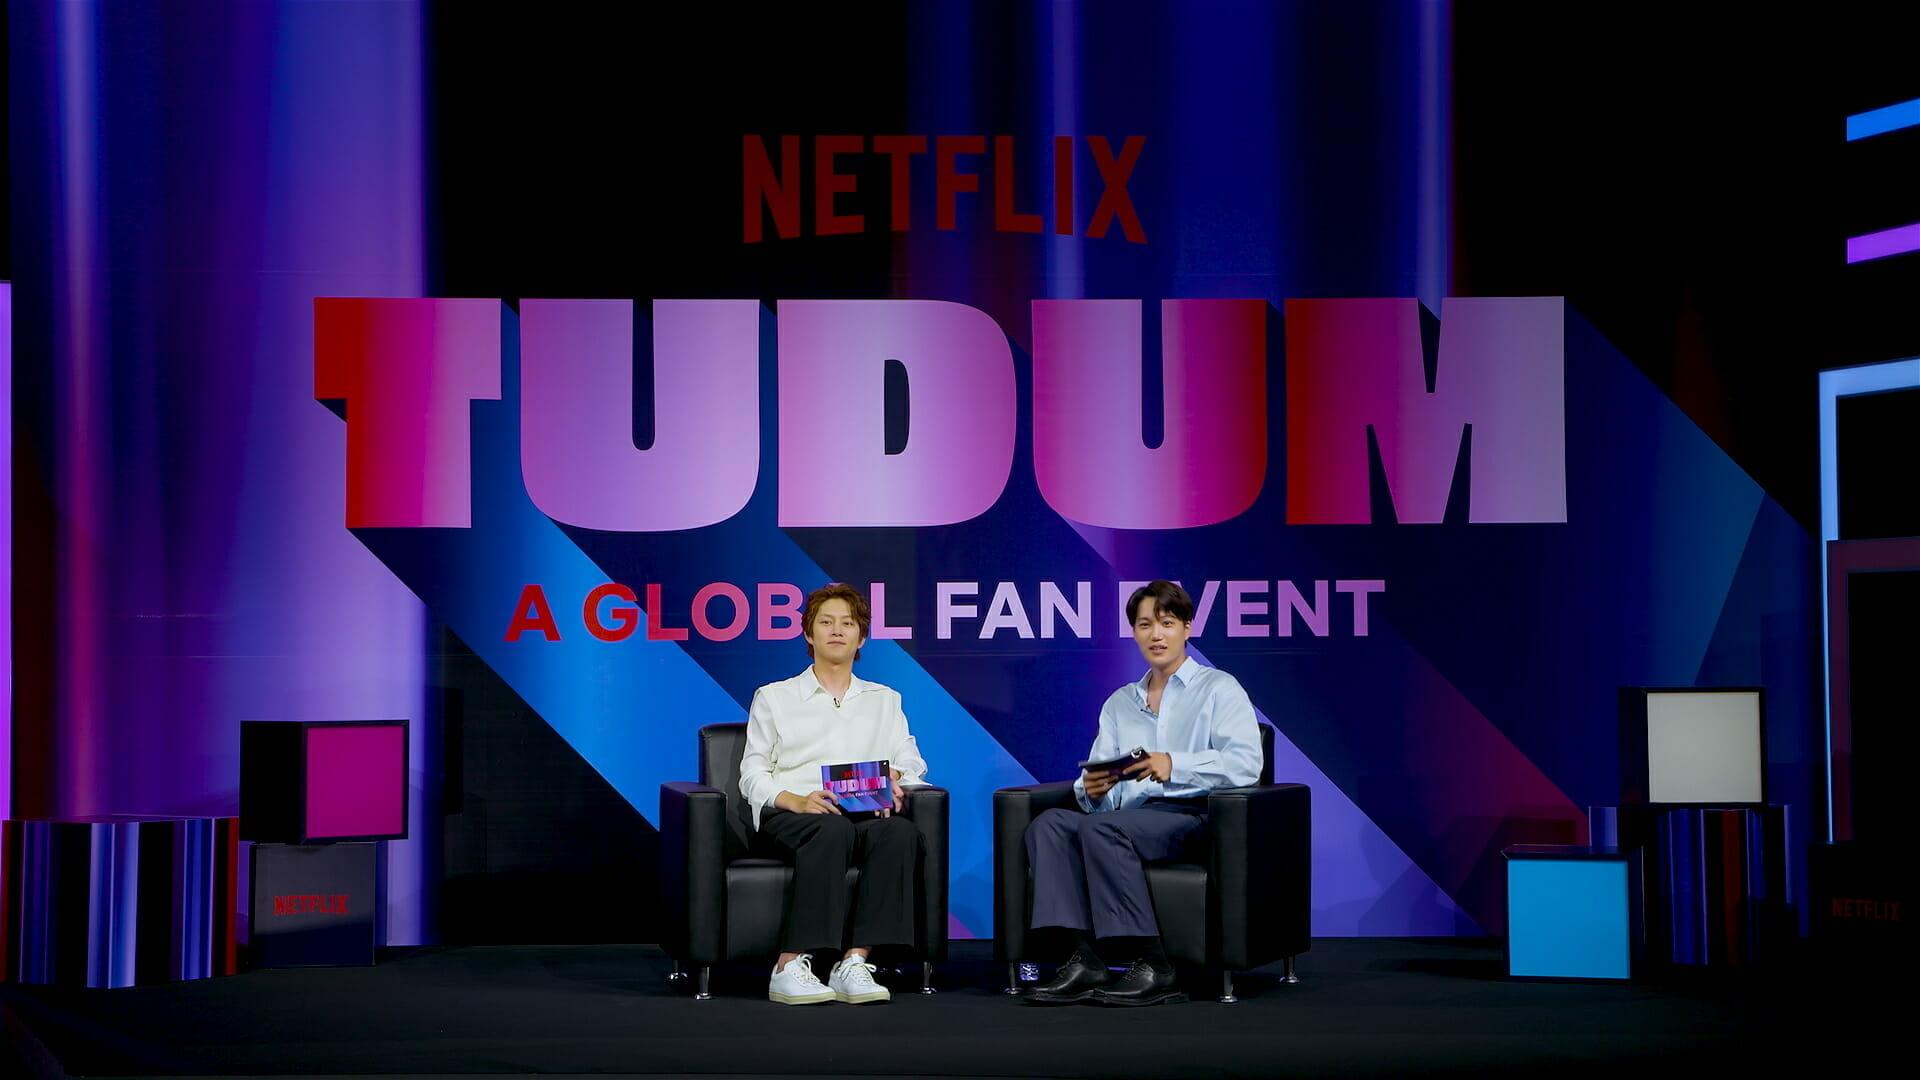 Biggest Reveals From TUDUM: A Netflix Global Fan Event